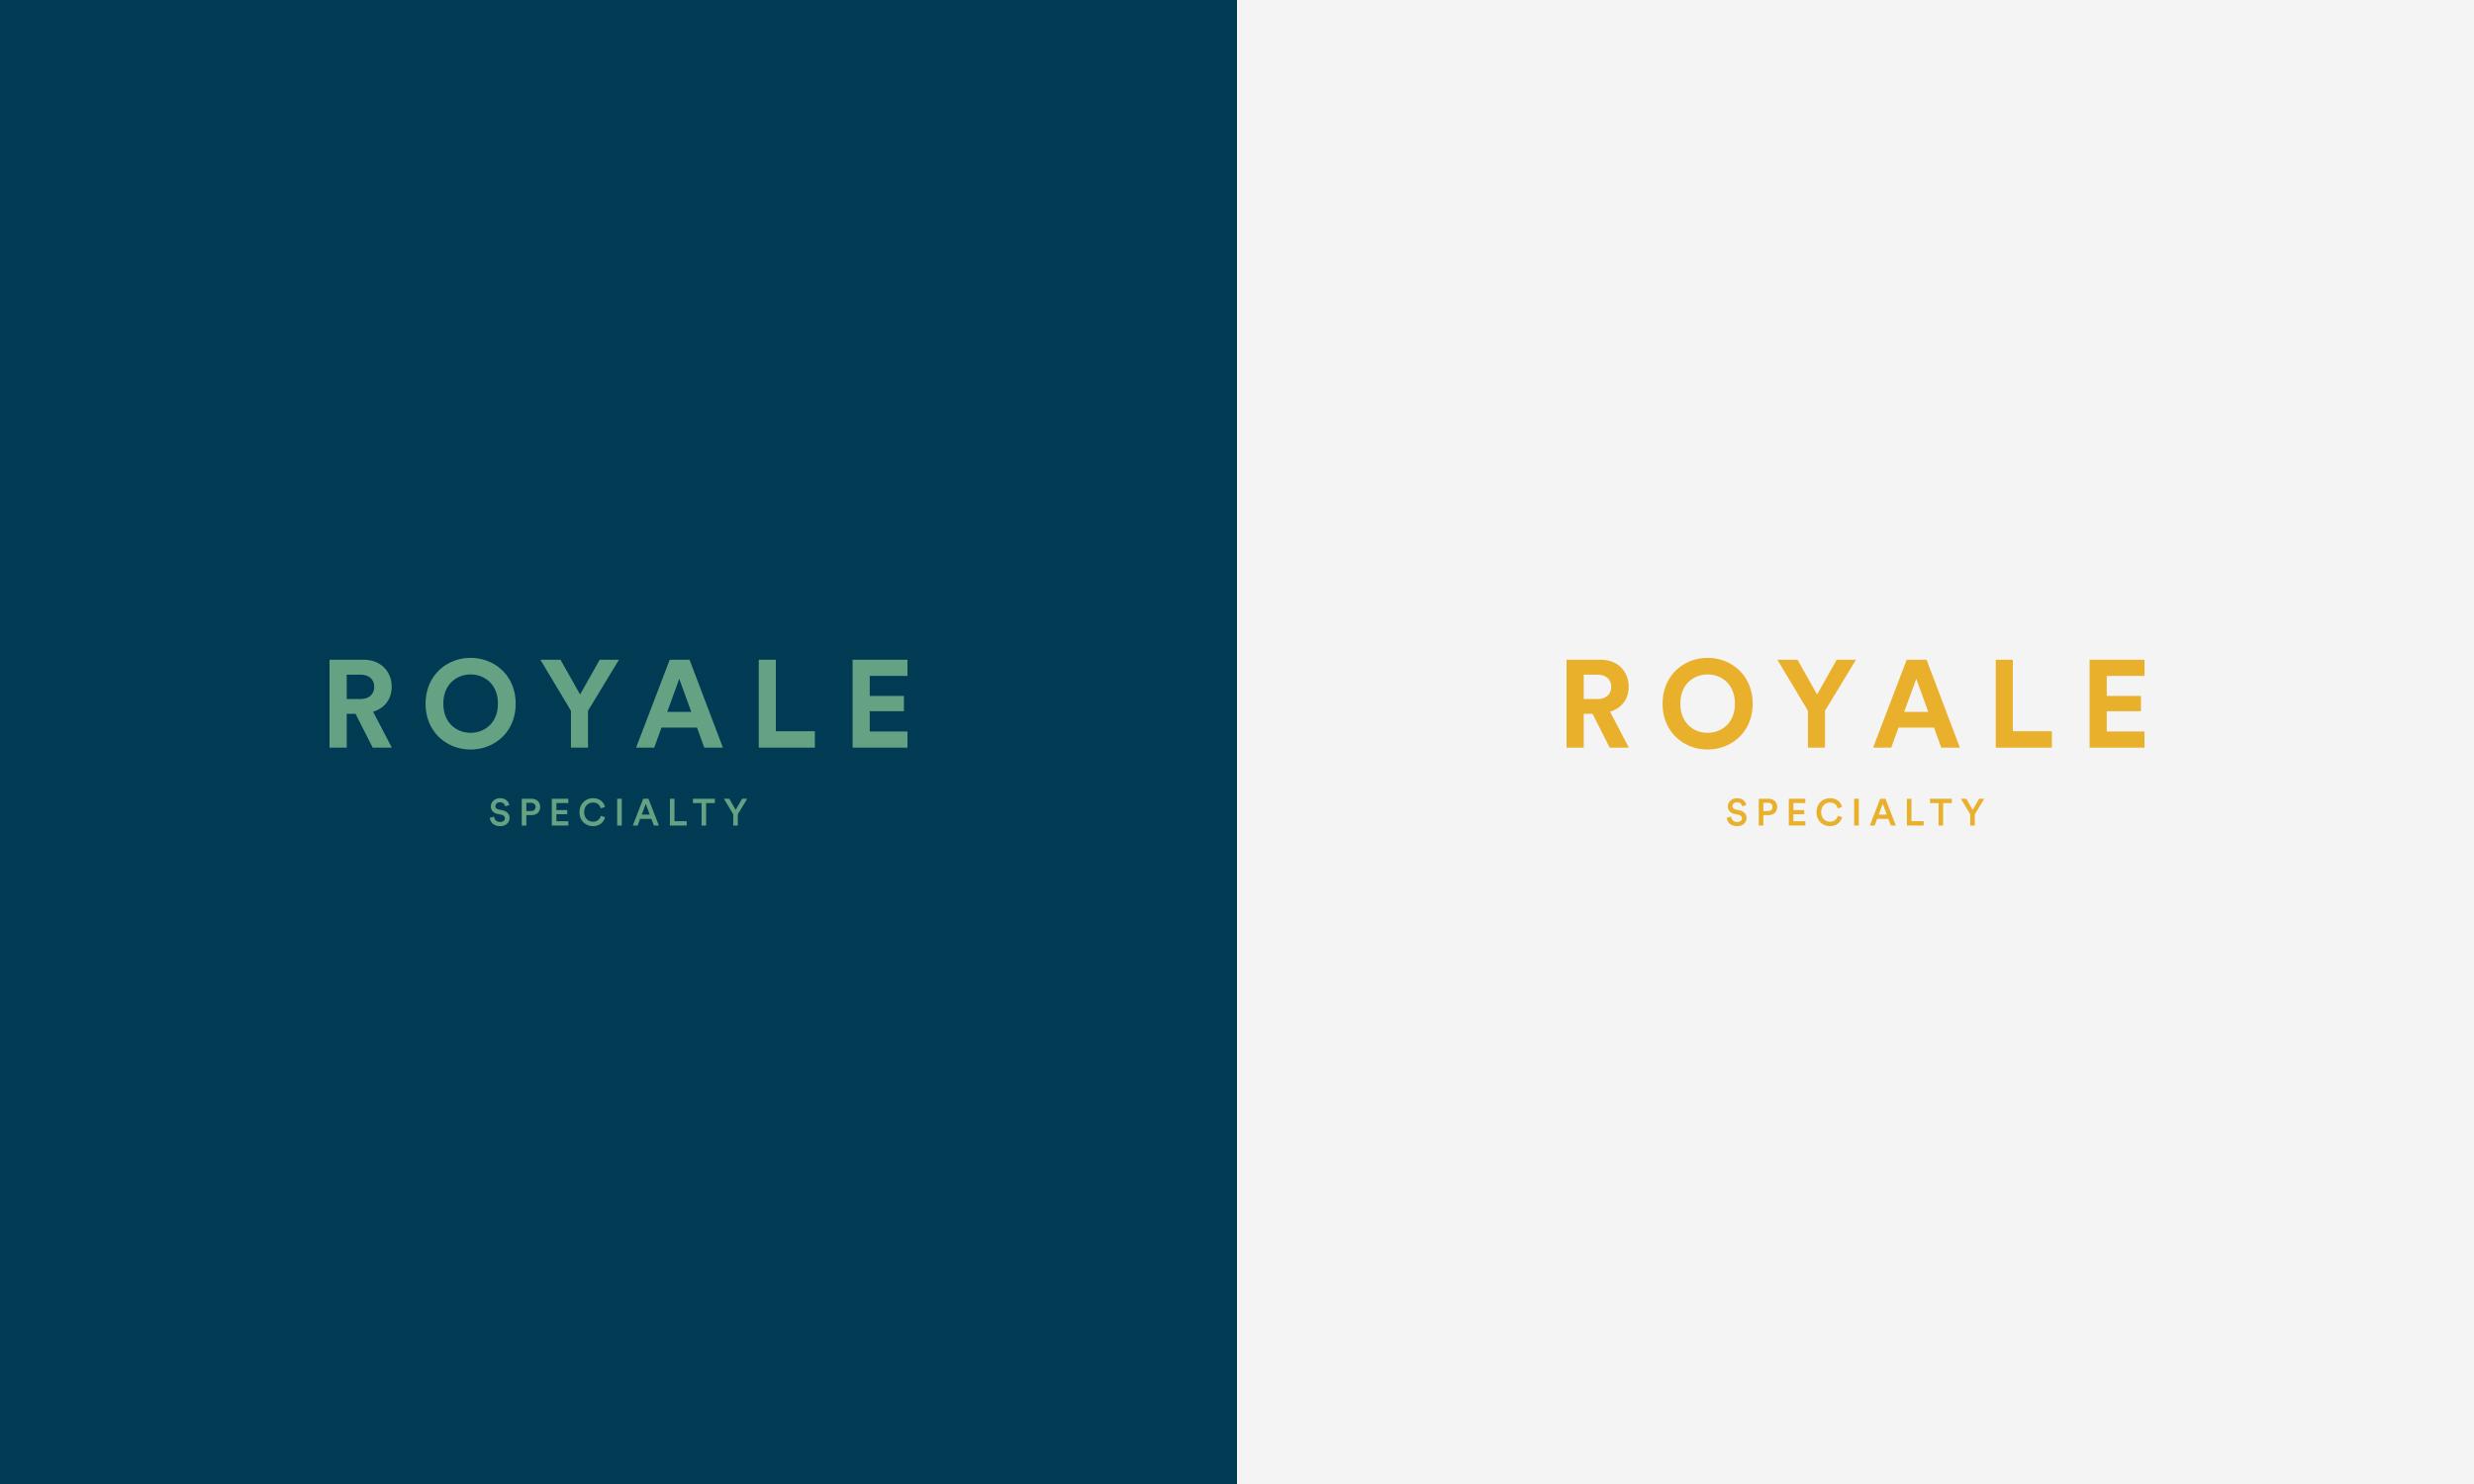 Nectar-&-Co-Royale-Specialty-Alternative-Logos.jpg